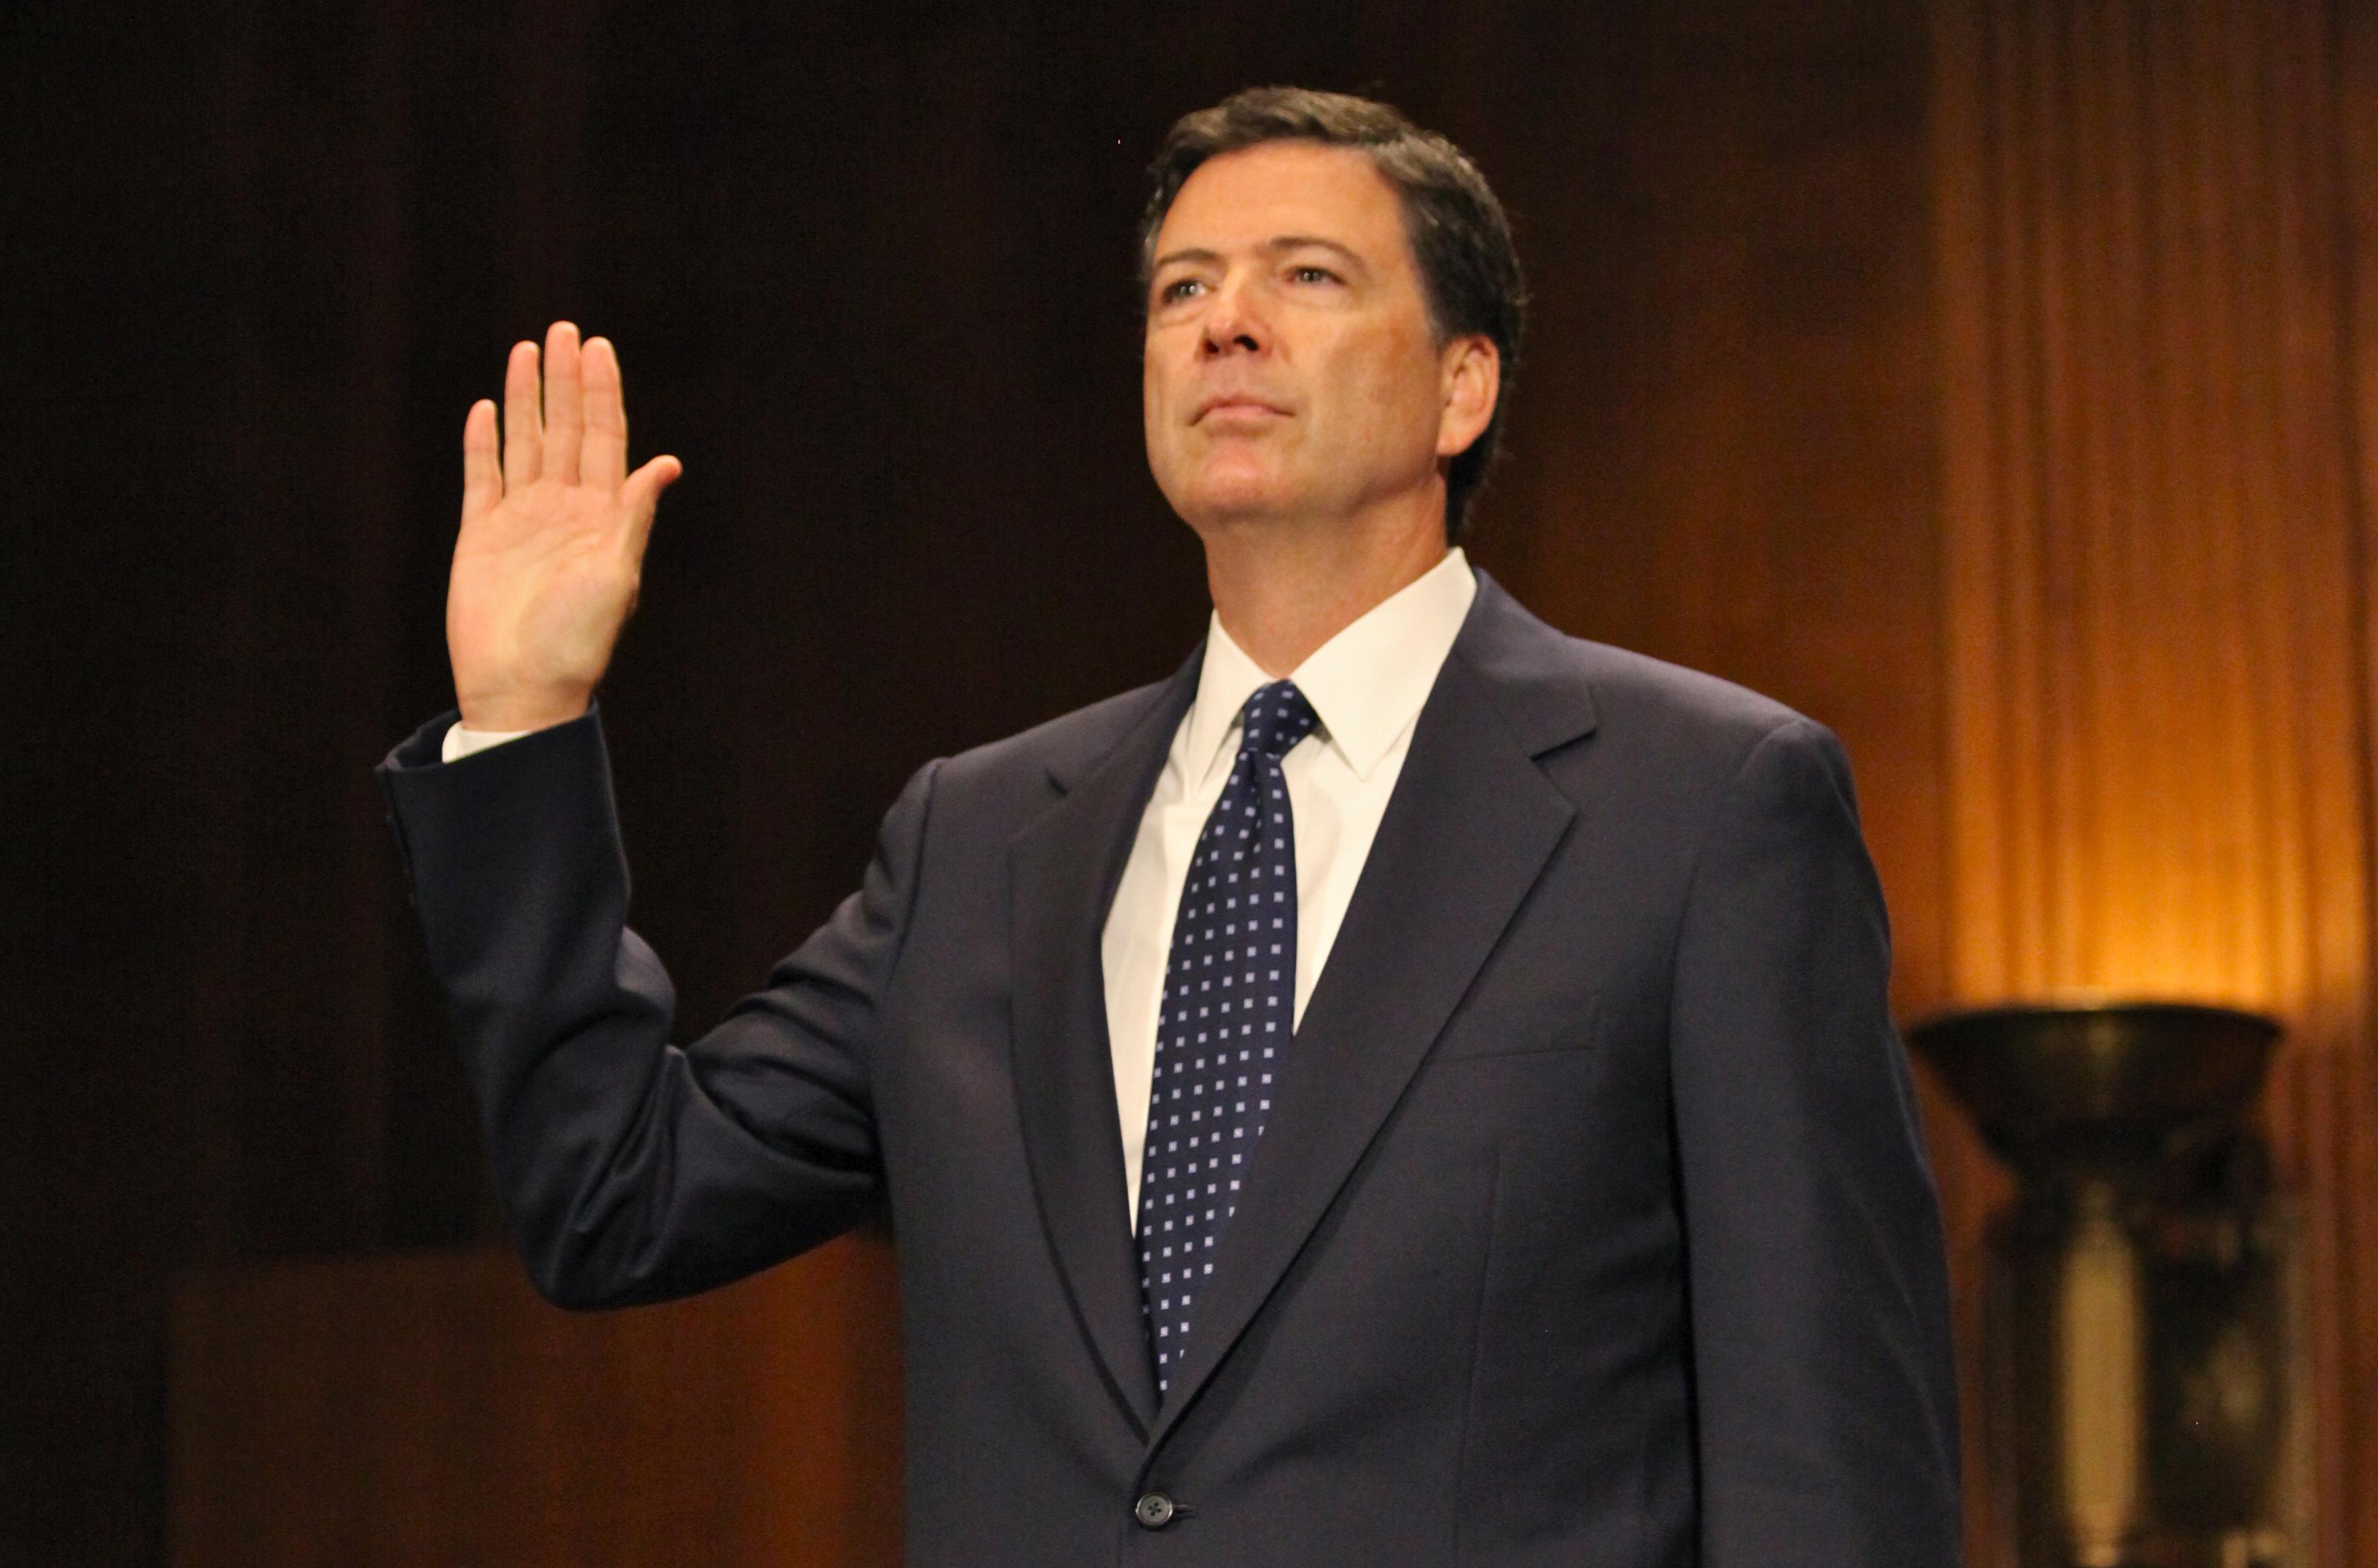 FBI director Comey praises Serbia